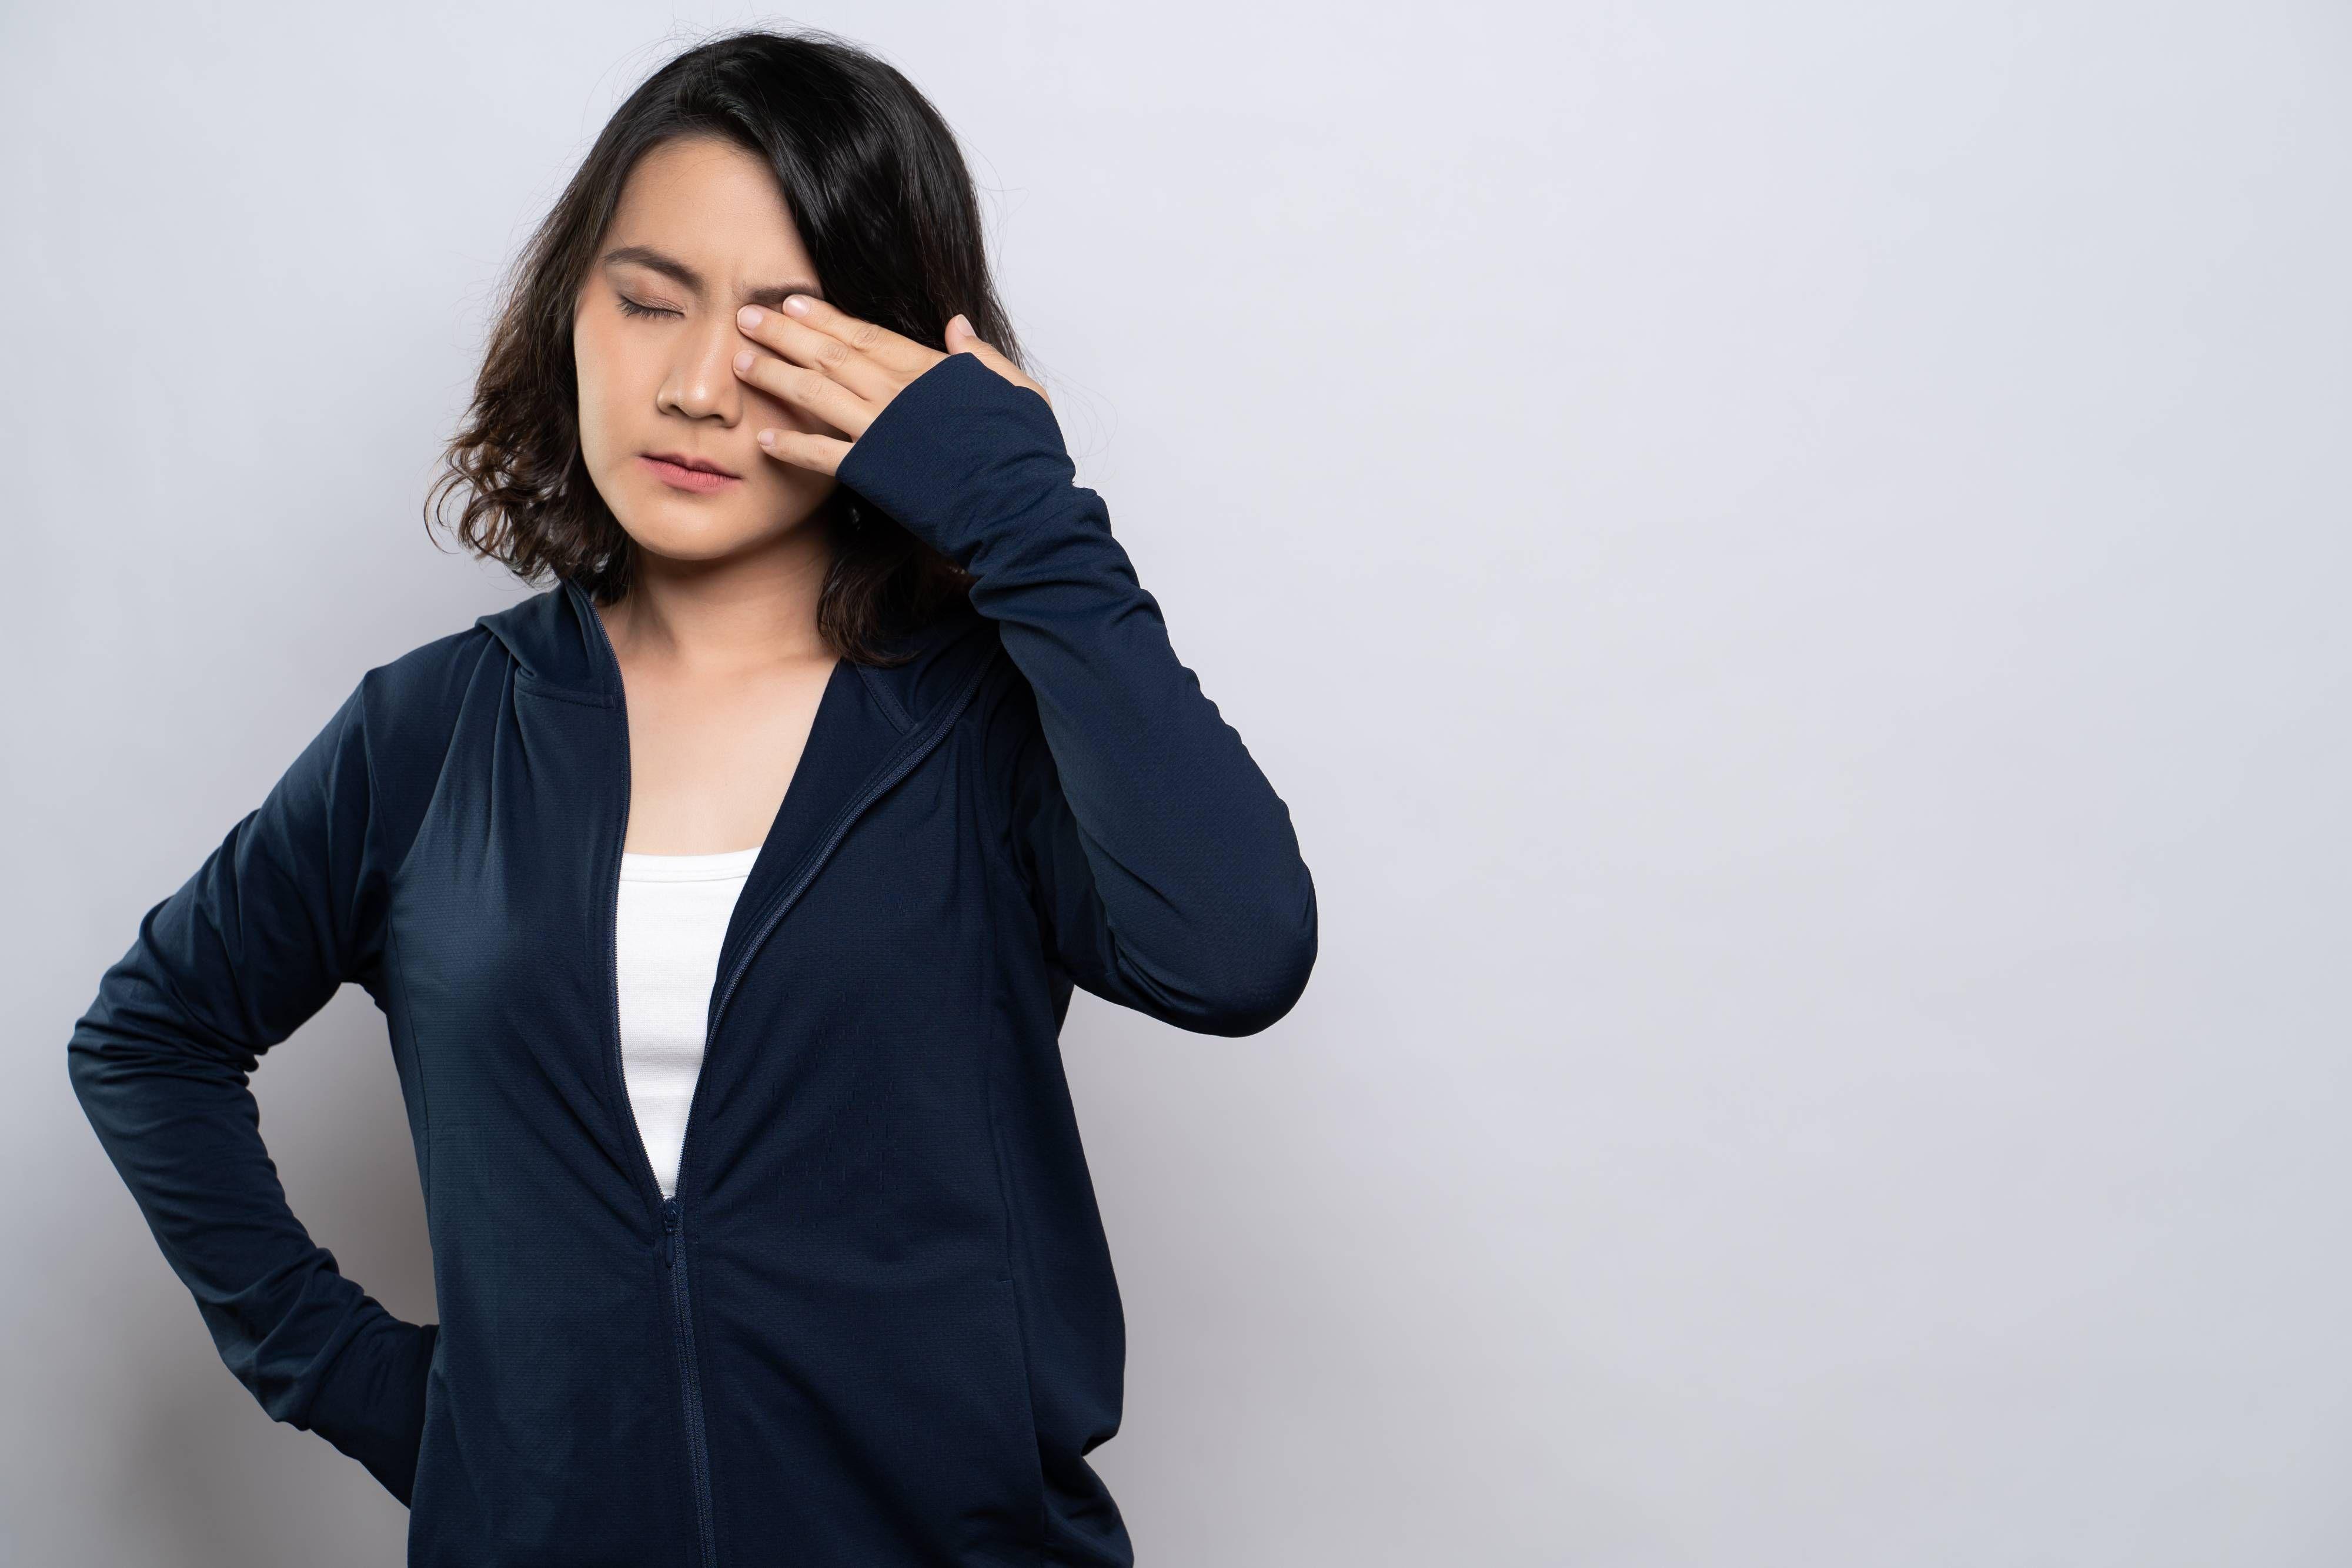 How to Diagnose & Treat Chronic Dry Eye